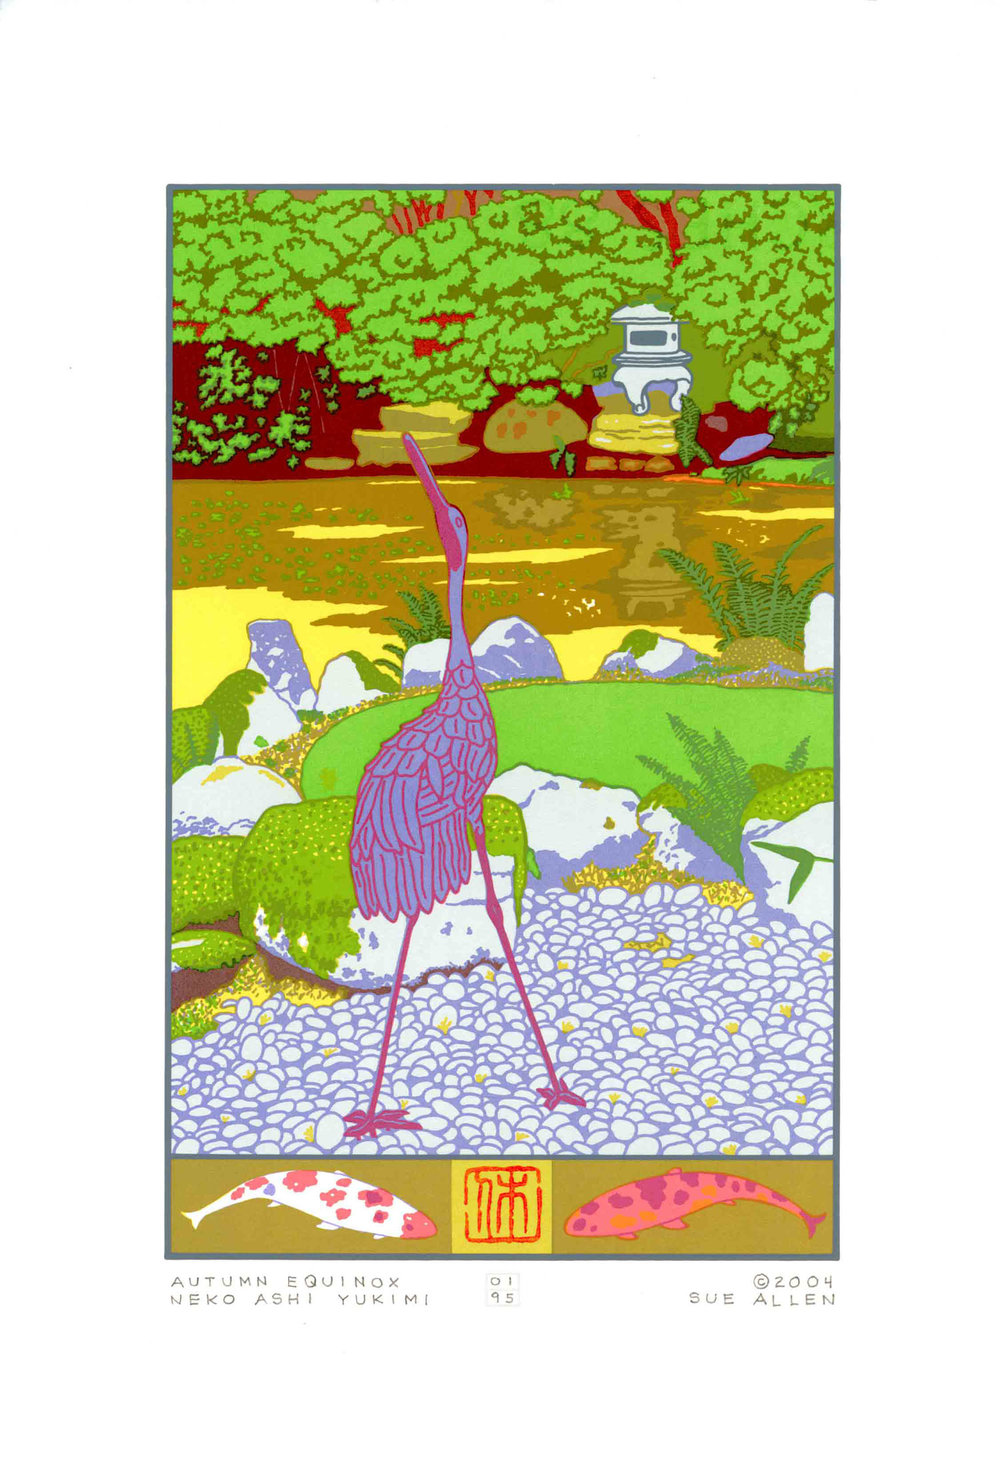 AUTUMN EQUINOX- NEKO ASHI YUKIMI  PEACE LANTERN